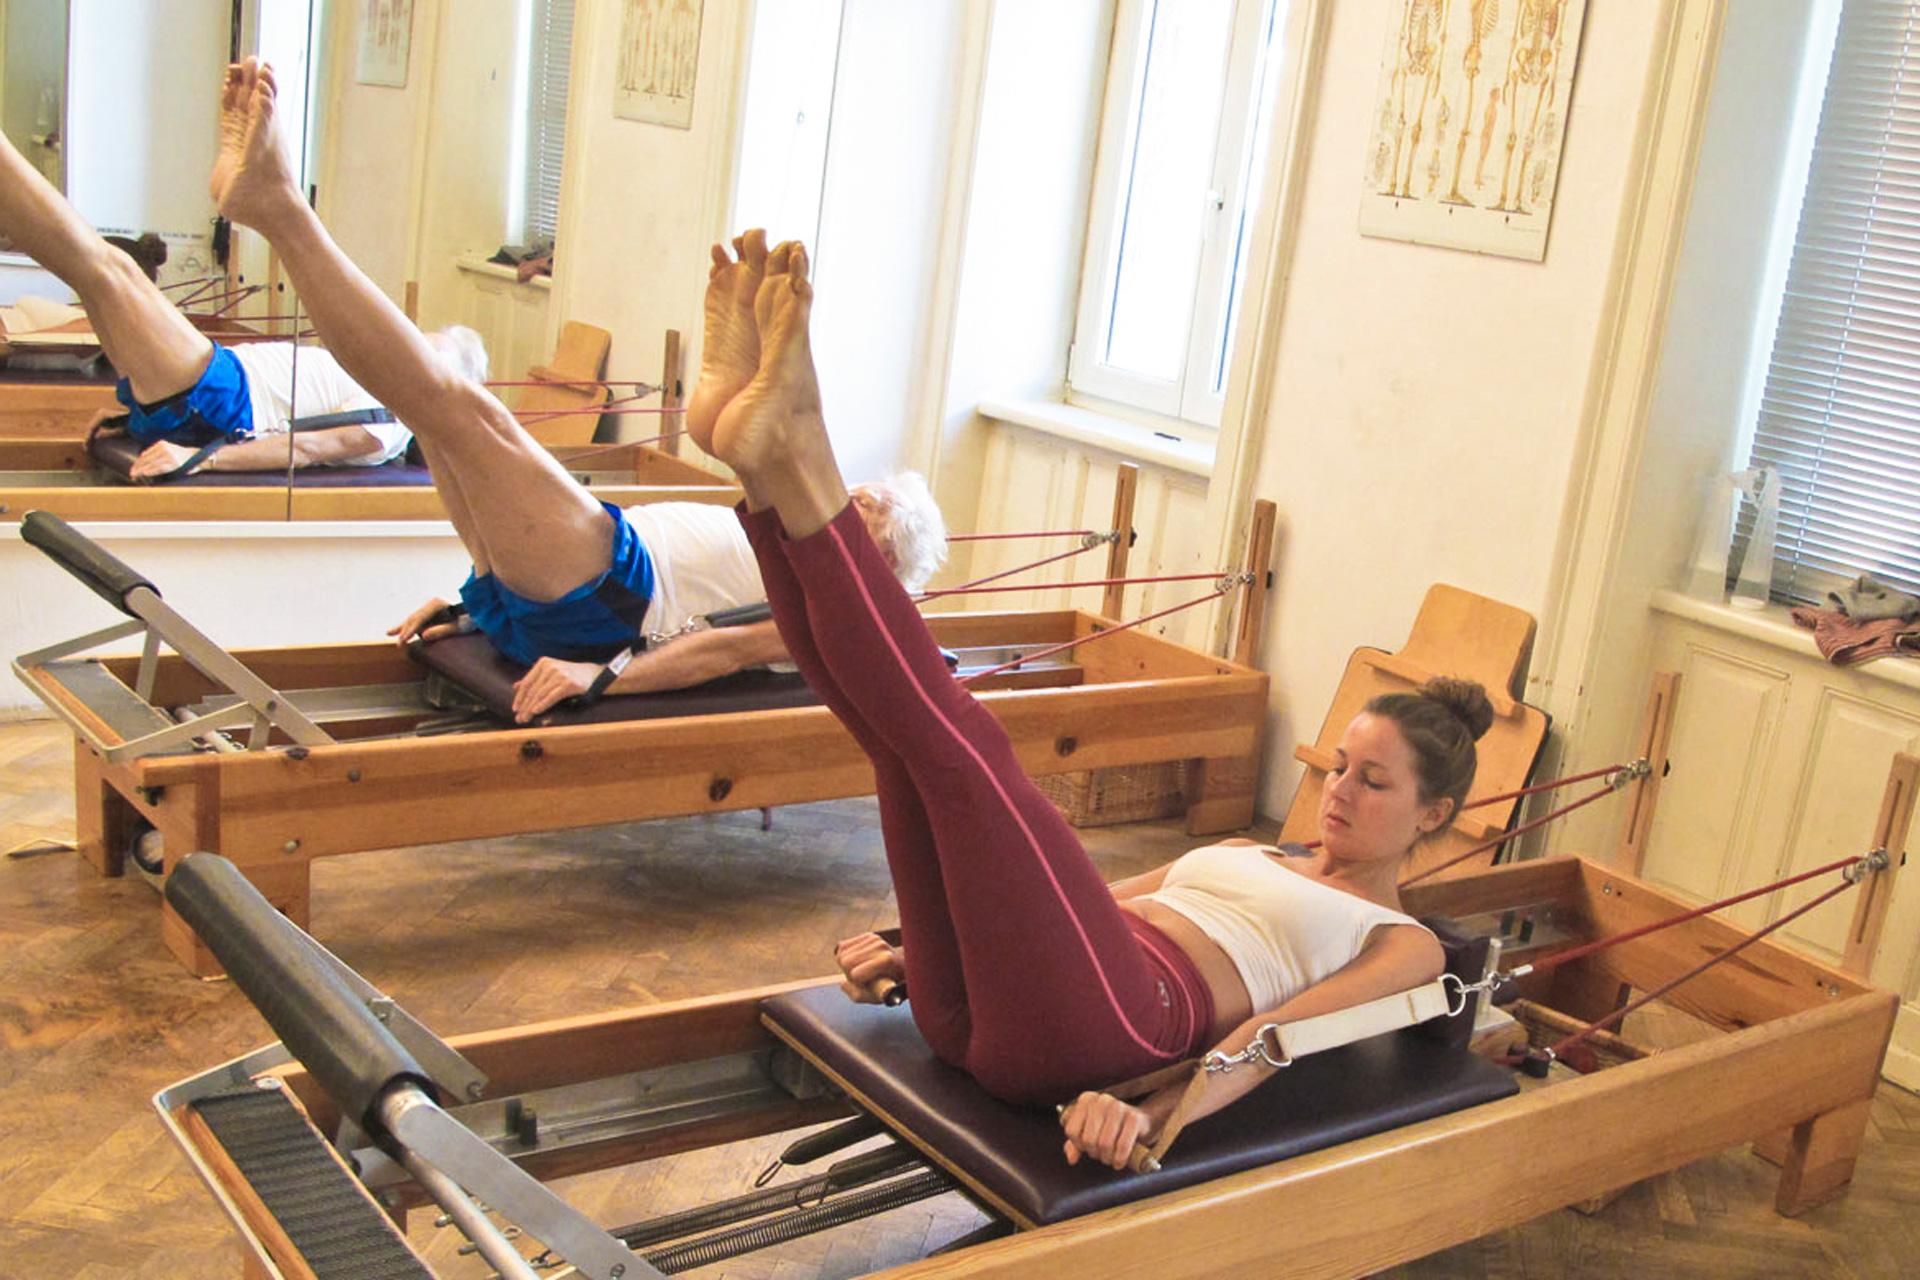 Pilates Hundred Reformer Matte Boden Bewegungsbewusstheit perzeptive Wahrnehmung therapeutischer Nutzen Fitness